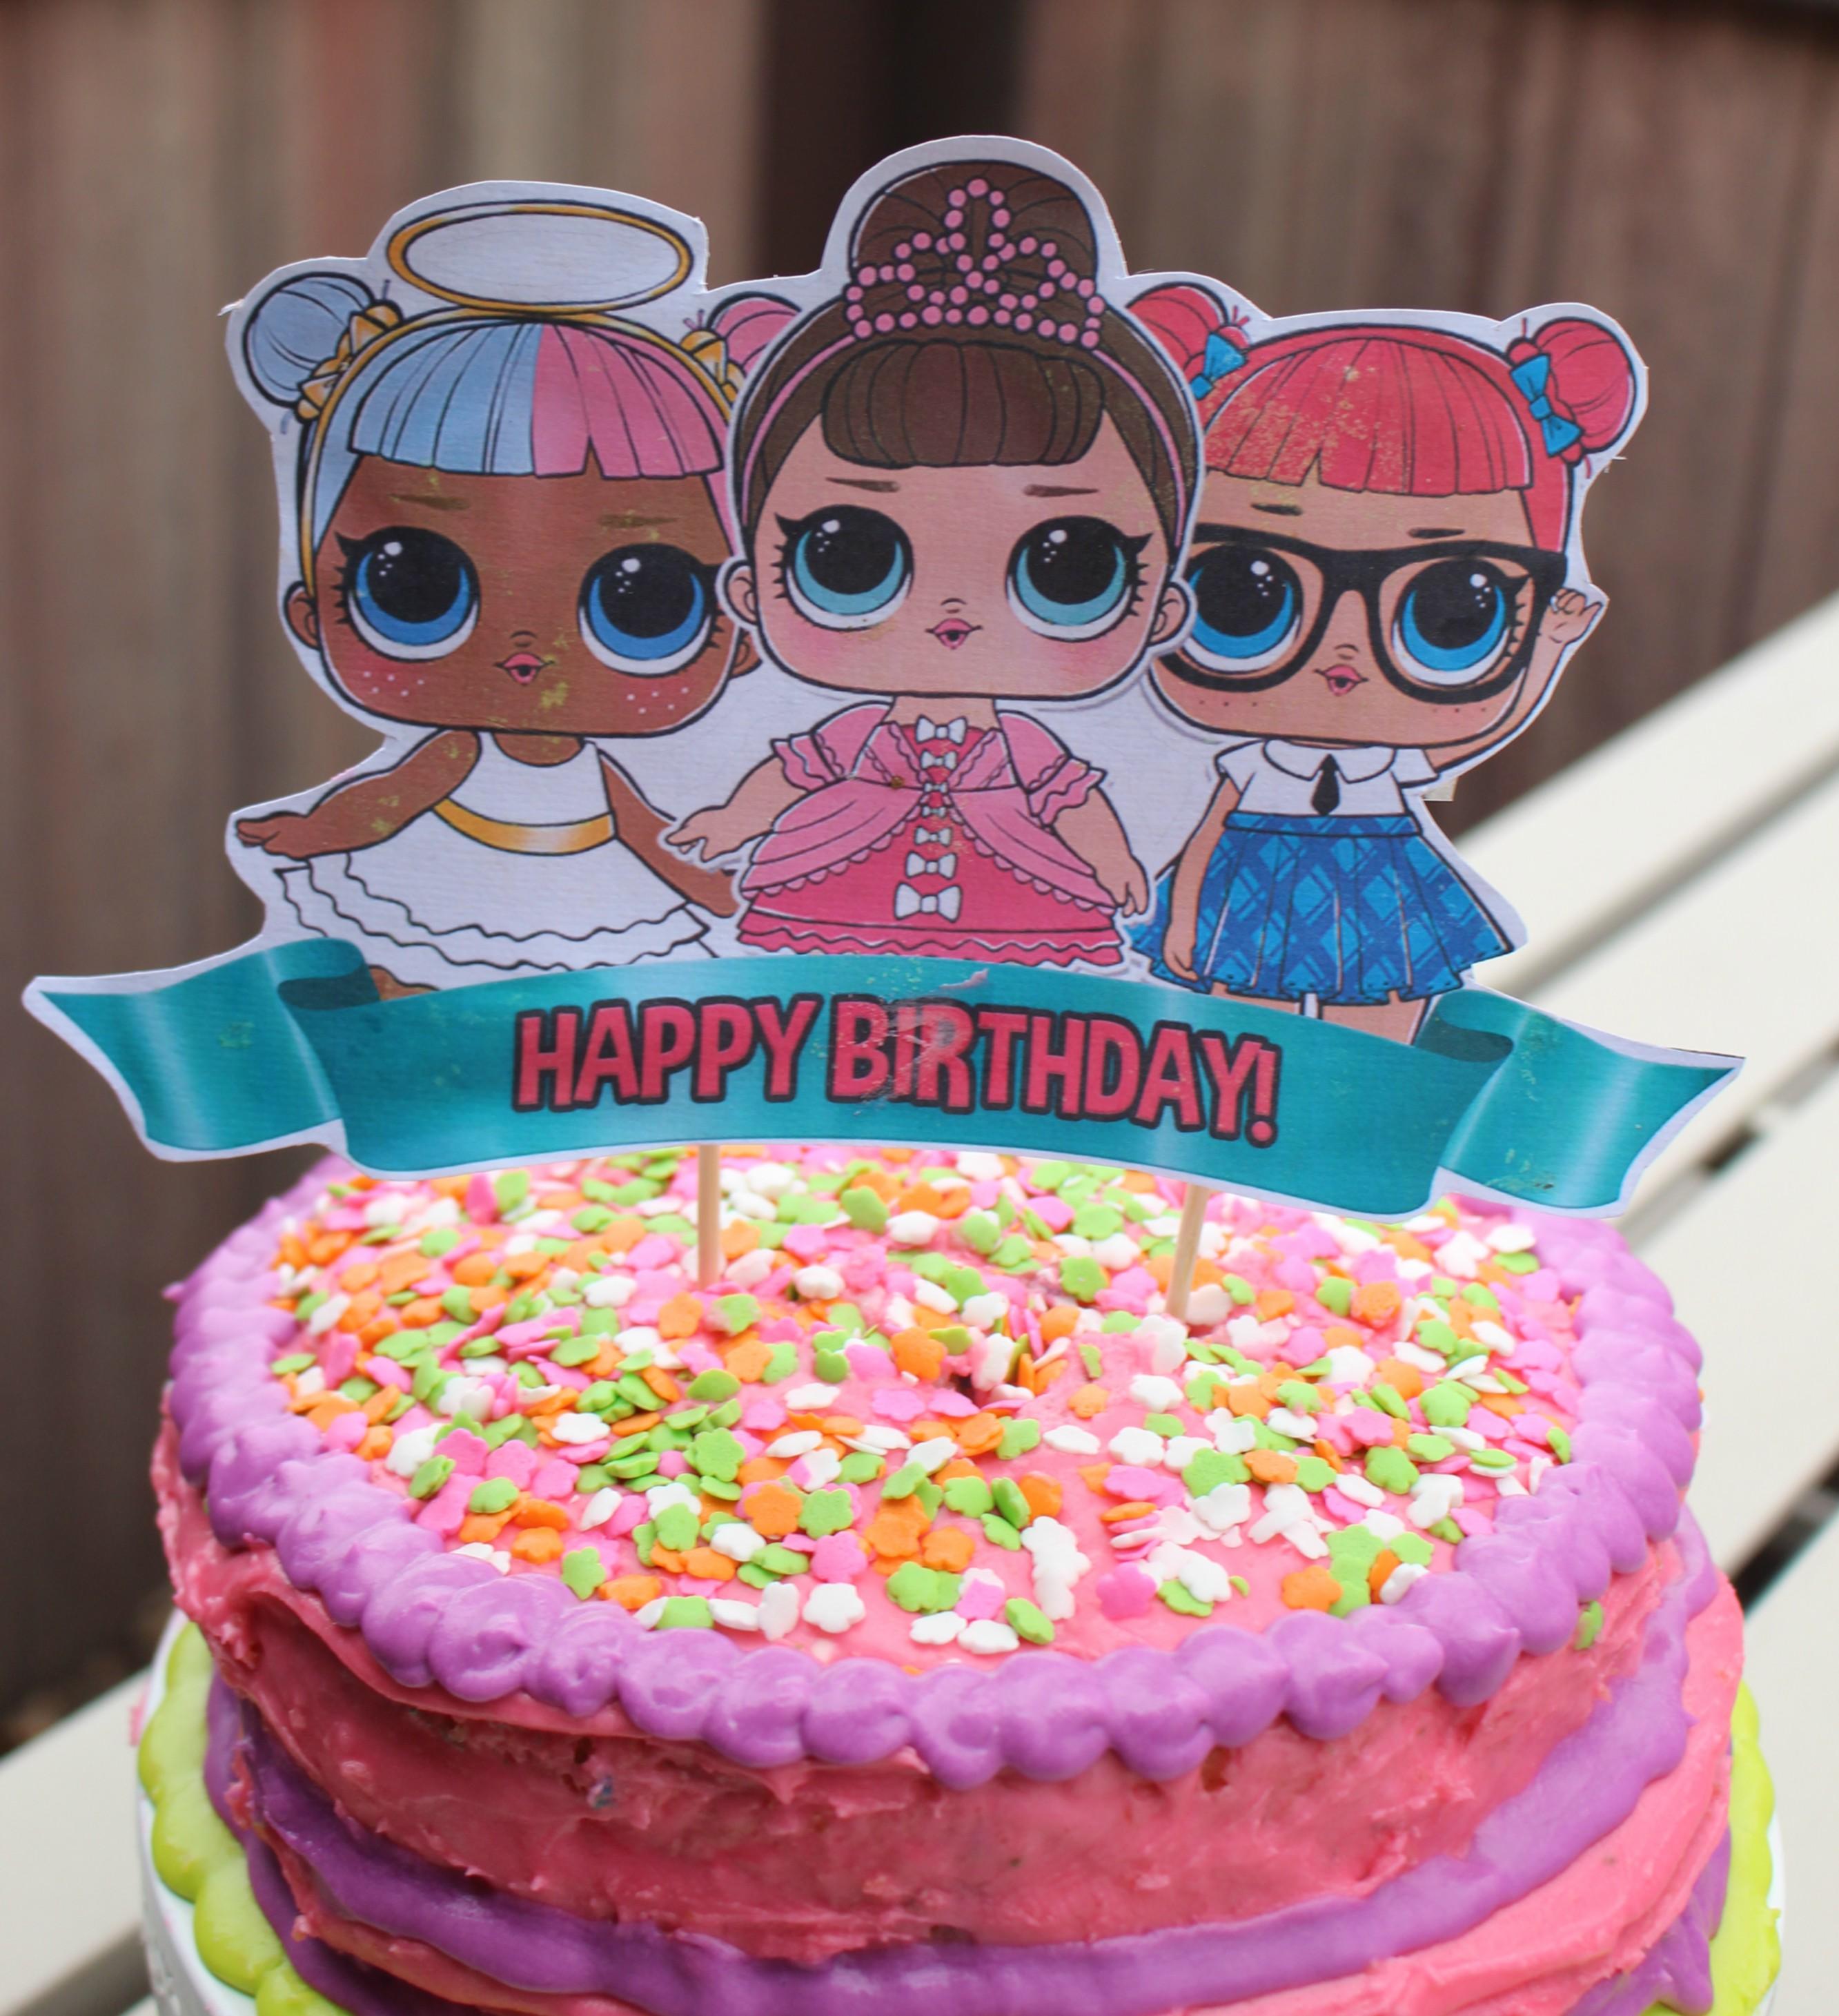 Enjoyable Easy Lol Surprise Doll Birthday Cake Superbowl Recap Burnt Apple Birthday Cards Printable Riciscafe Filternl